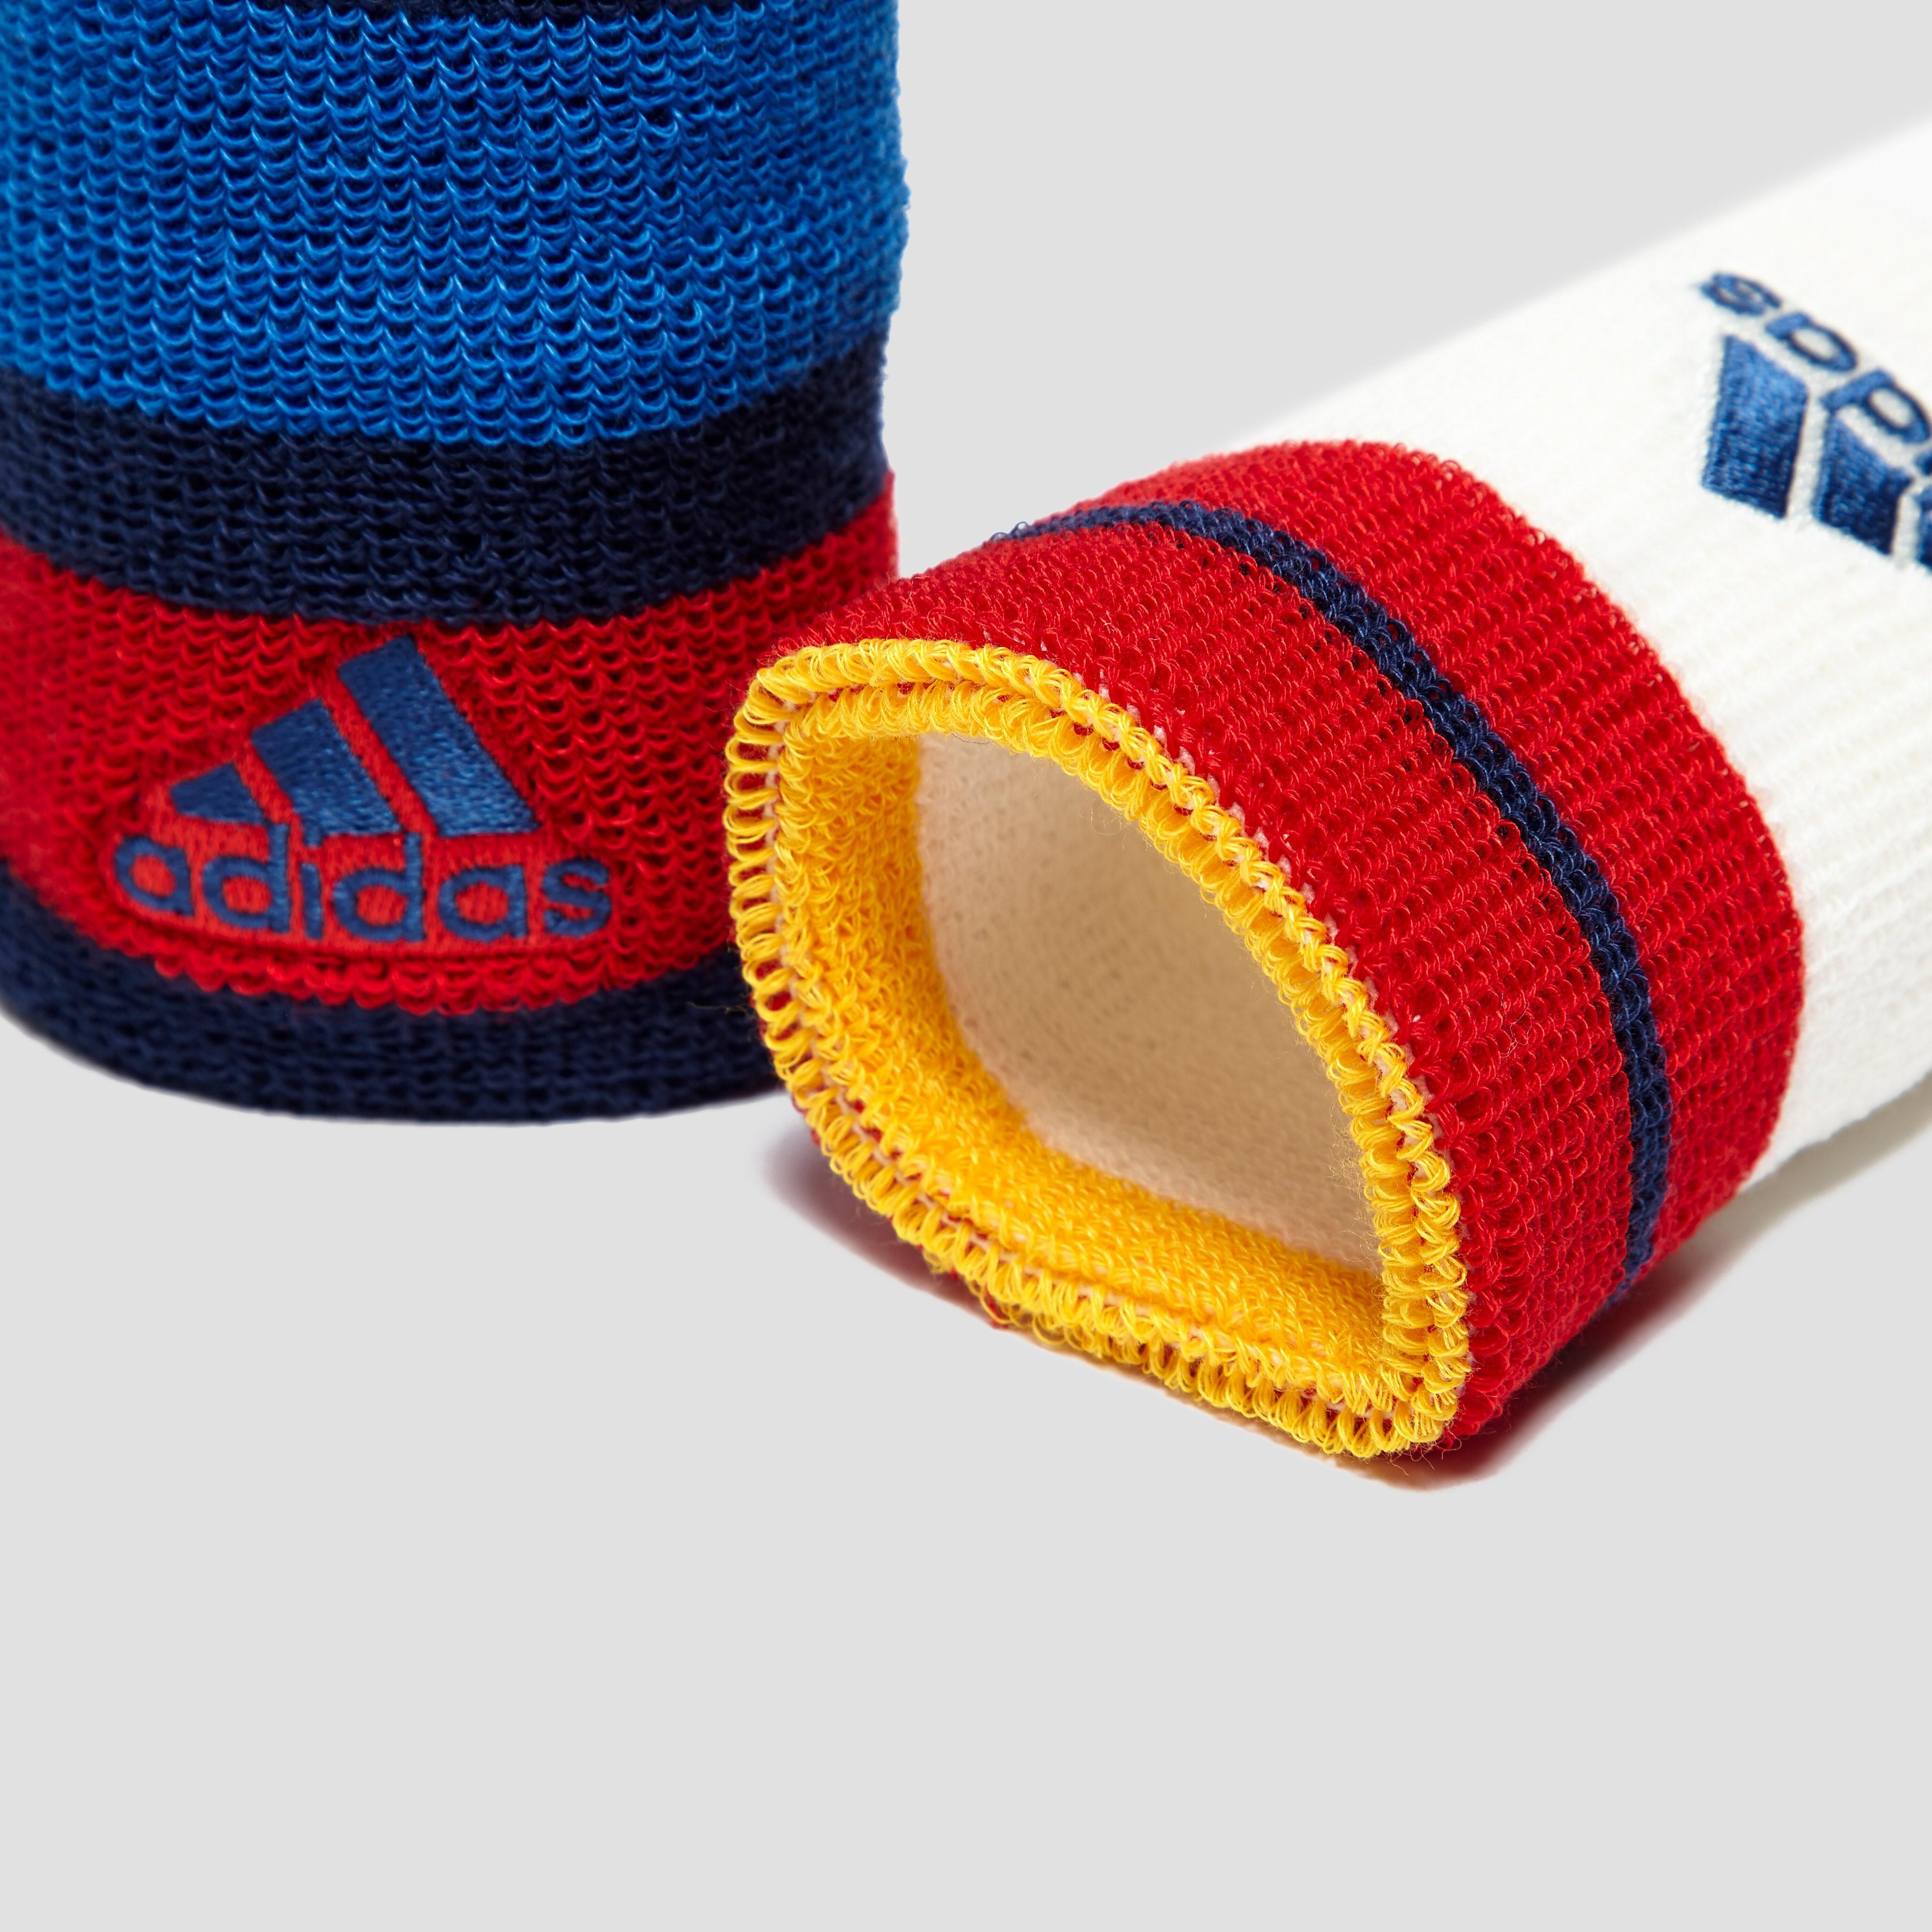 adidas Pharrell Williams New York Tennis Wristbands